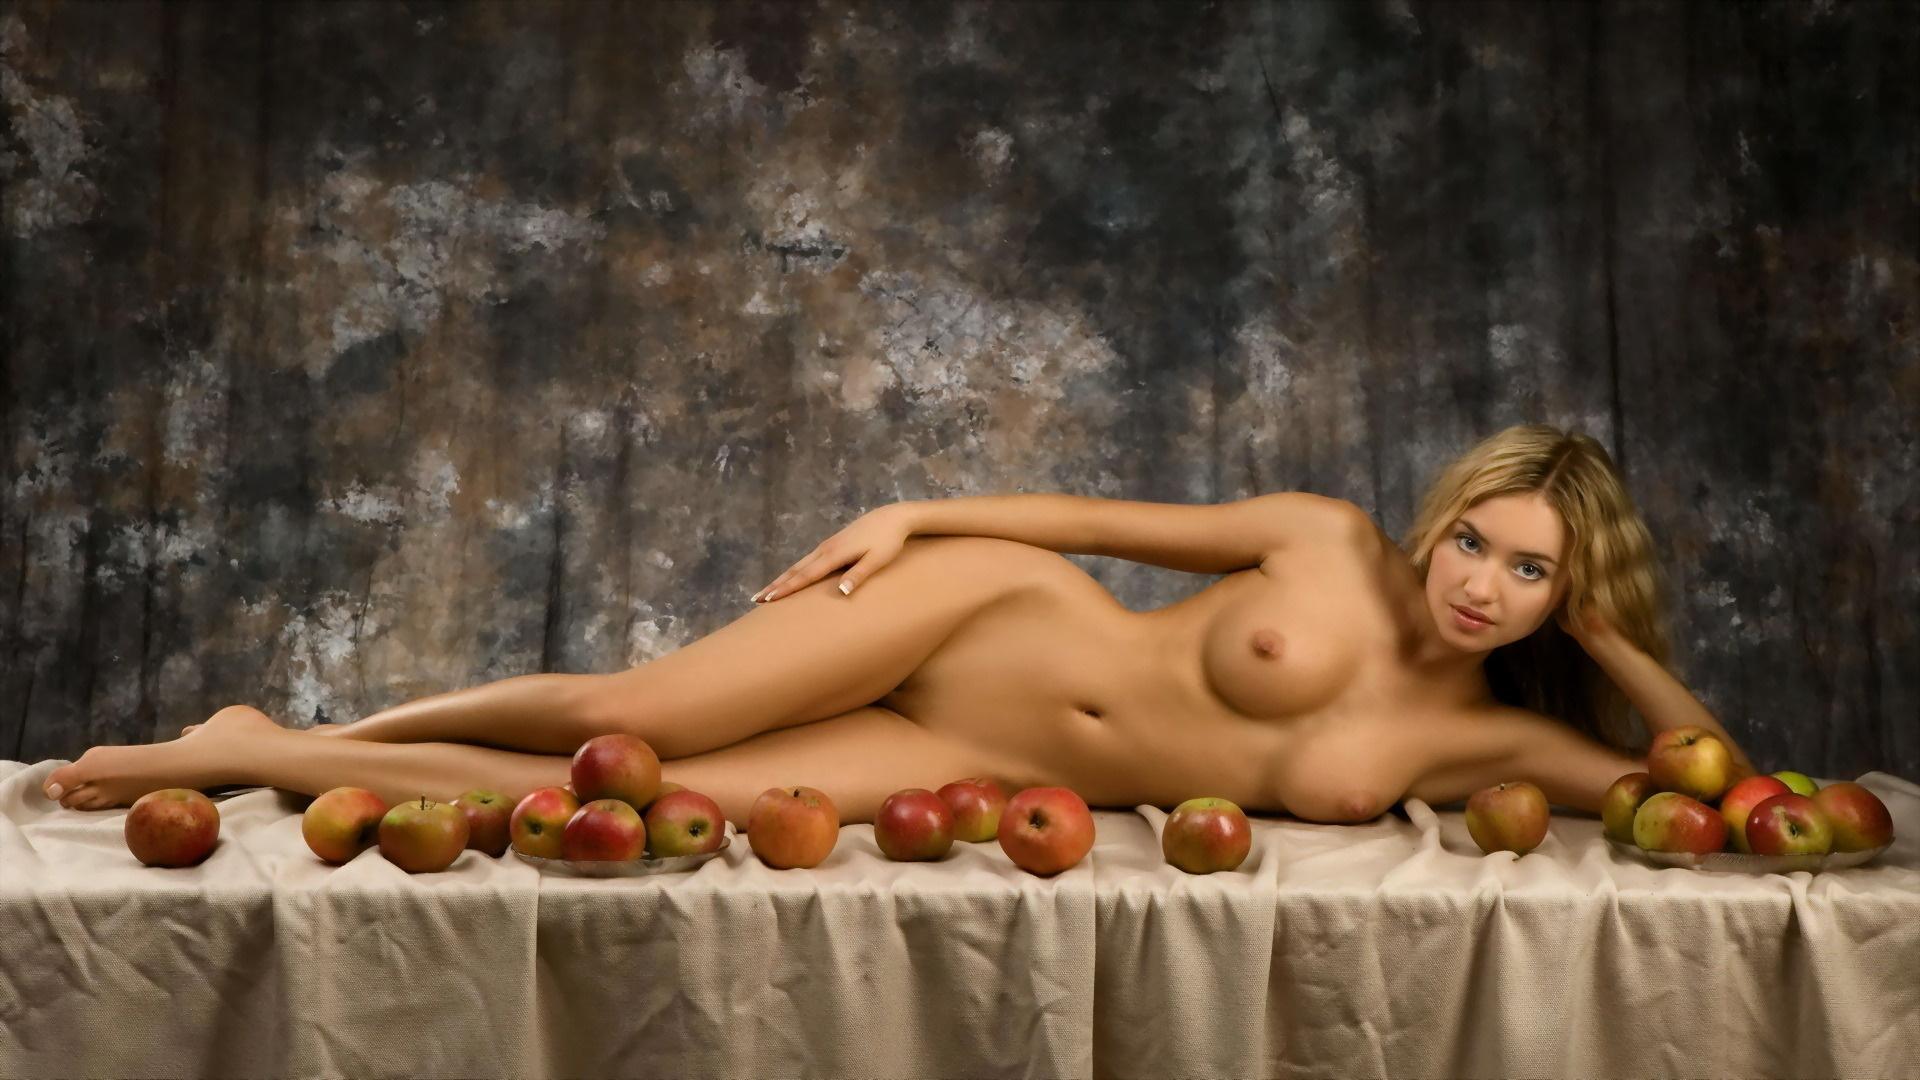 Wallpaper lia may, lia, apple, nude, tits, apple, apples, widescreen ...